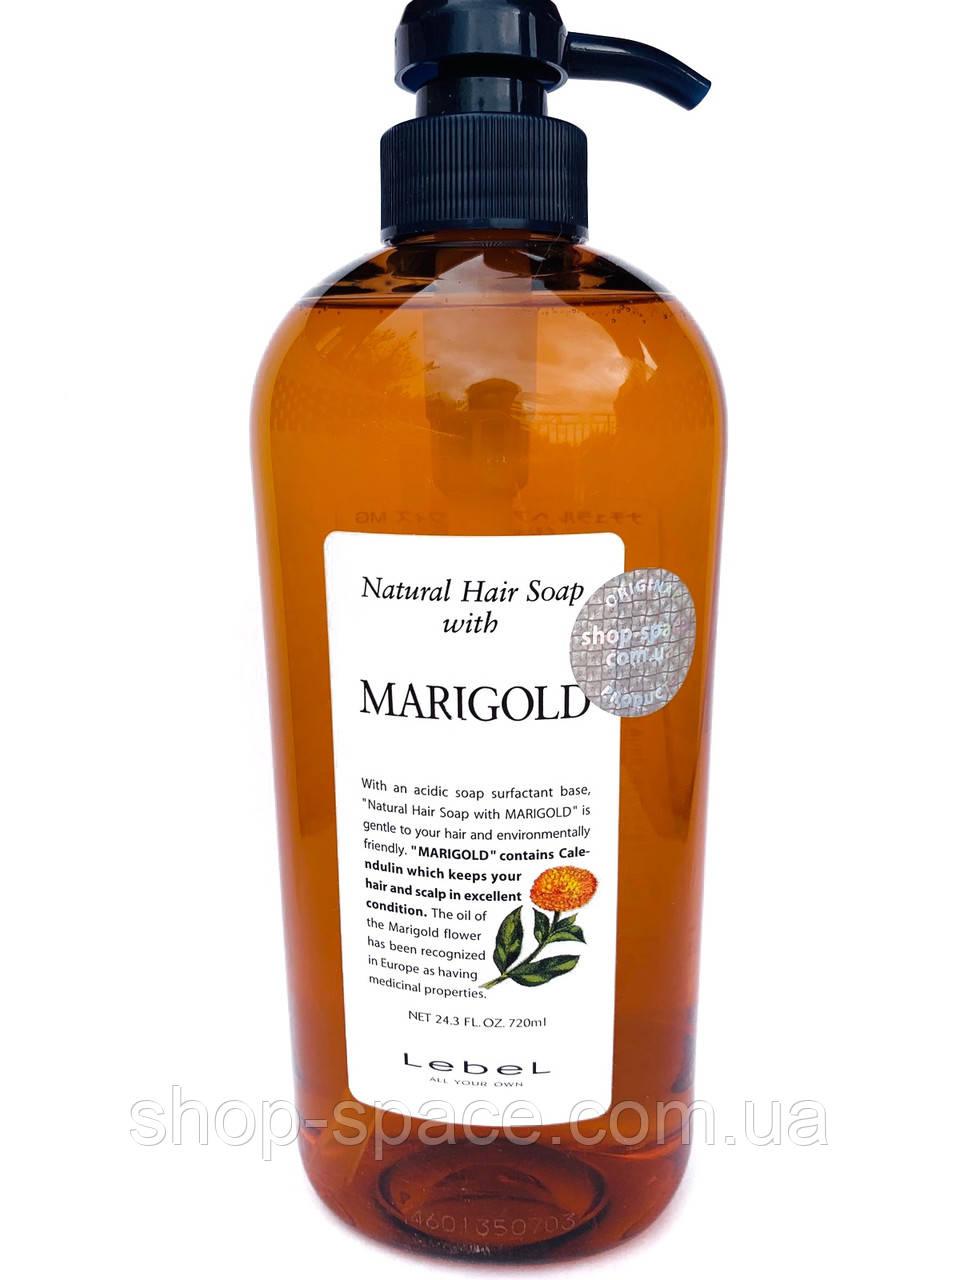 Шампунь Lebel Hair Soap with Marigold (с экстрактом календулы), 720мл